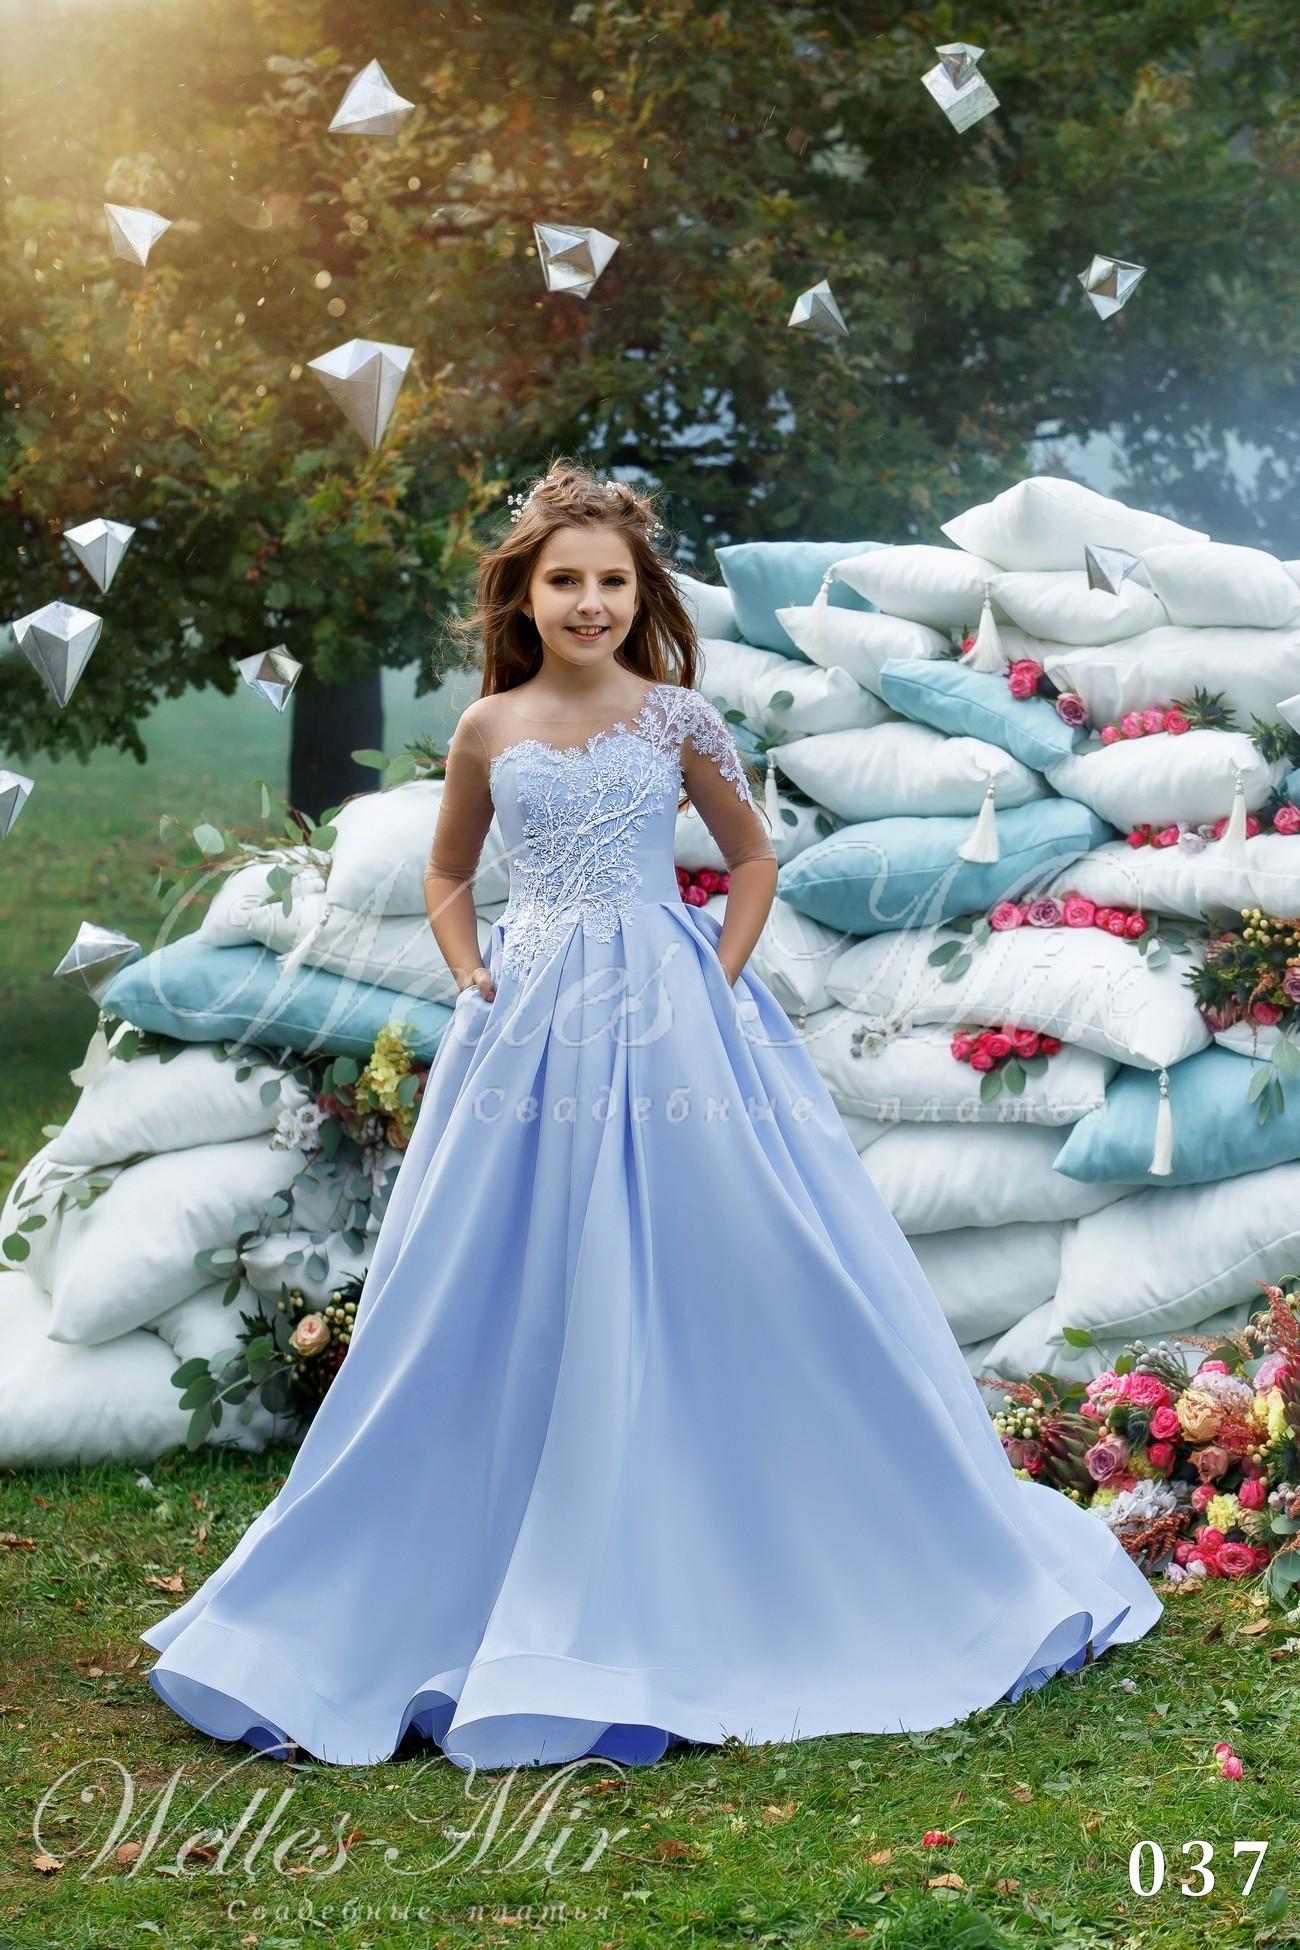 Дитячі сукні Kids Deluxe Collection 2018 - 037